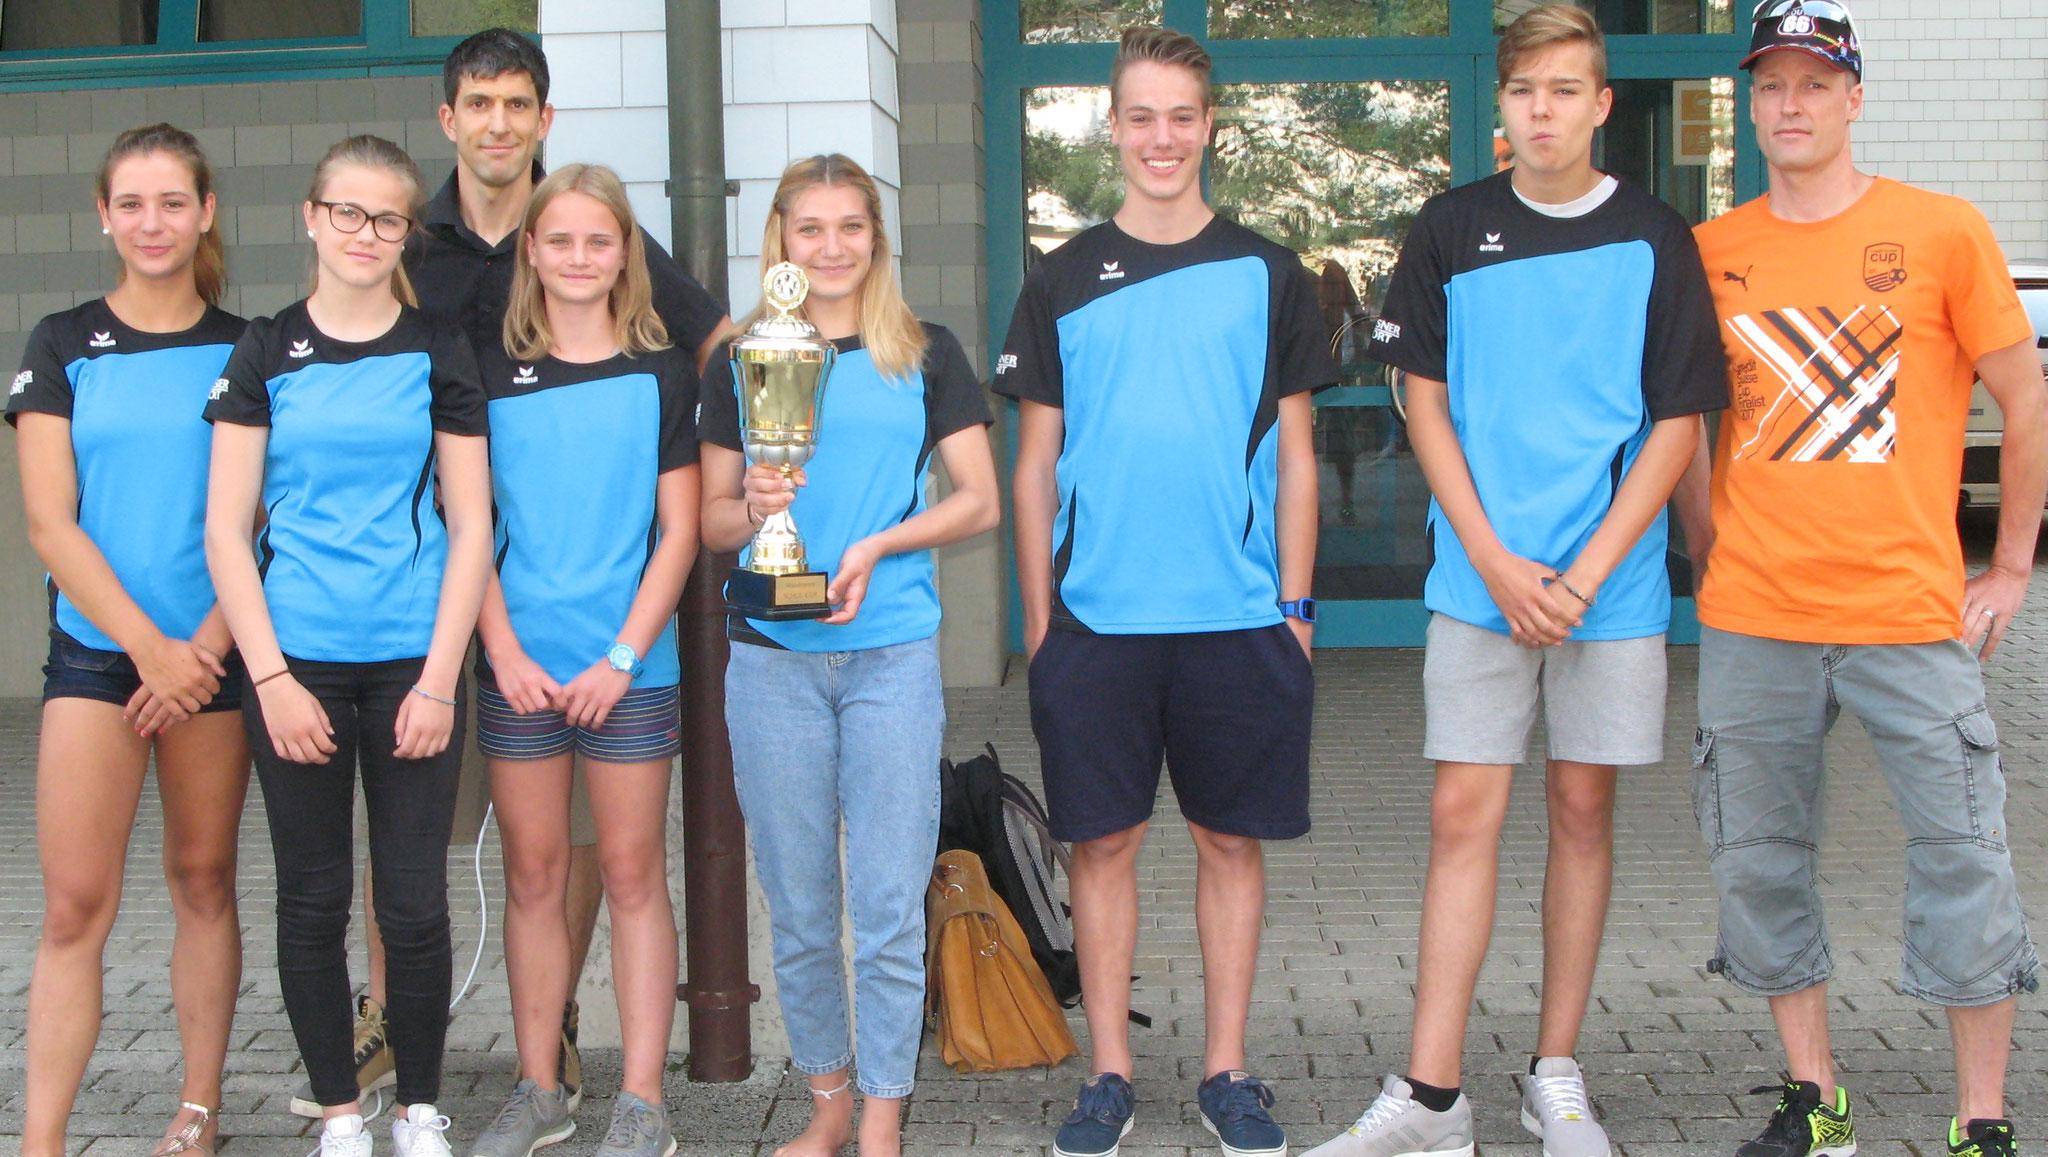 Pokalübergabe Glarner Schul-Cup 2016-17